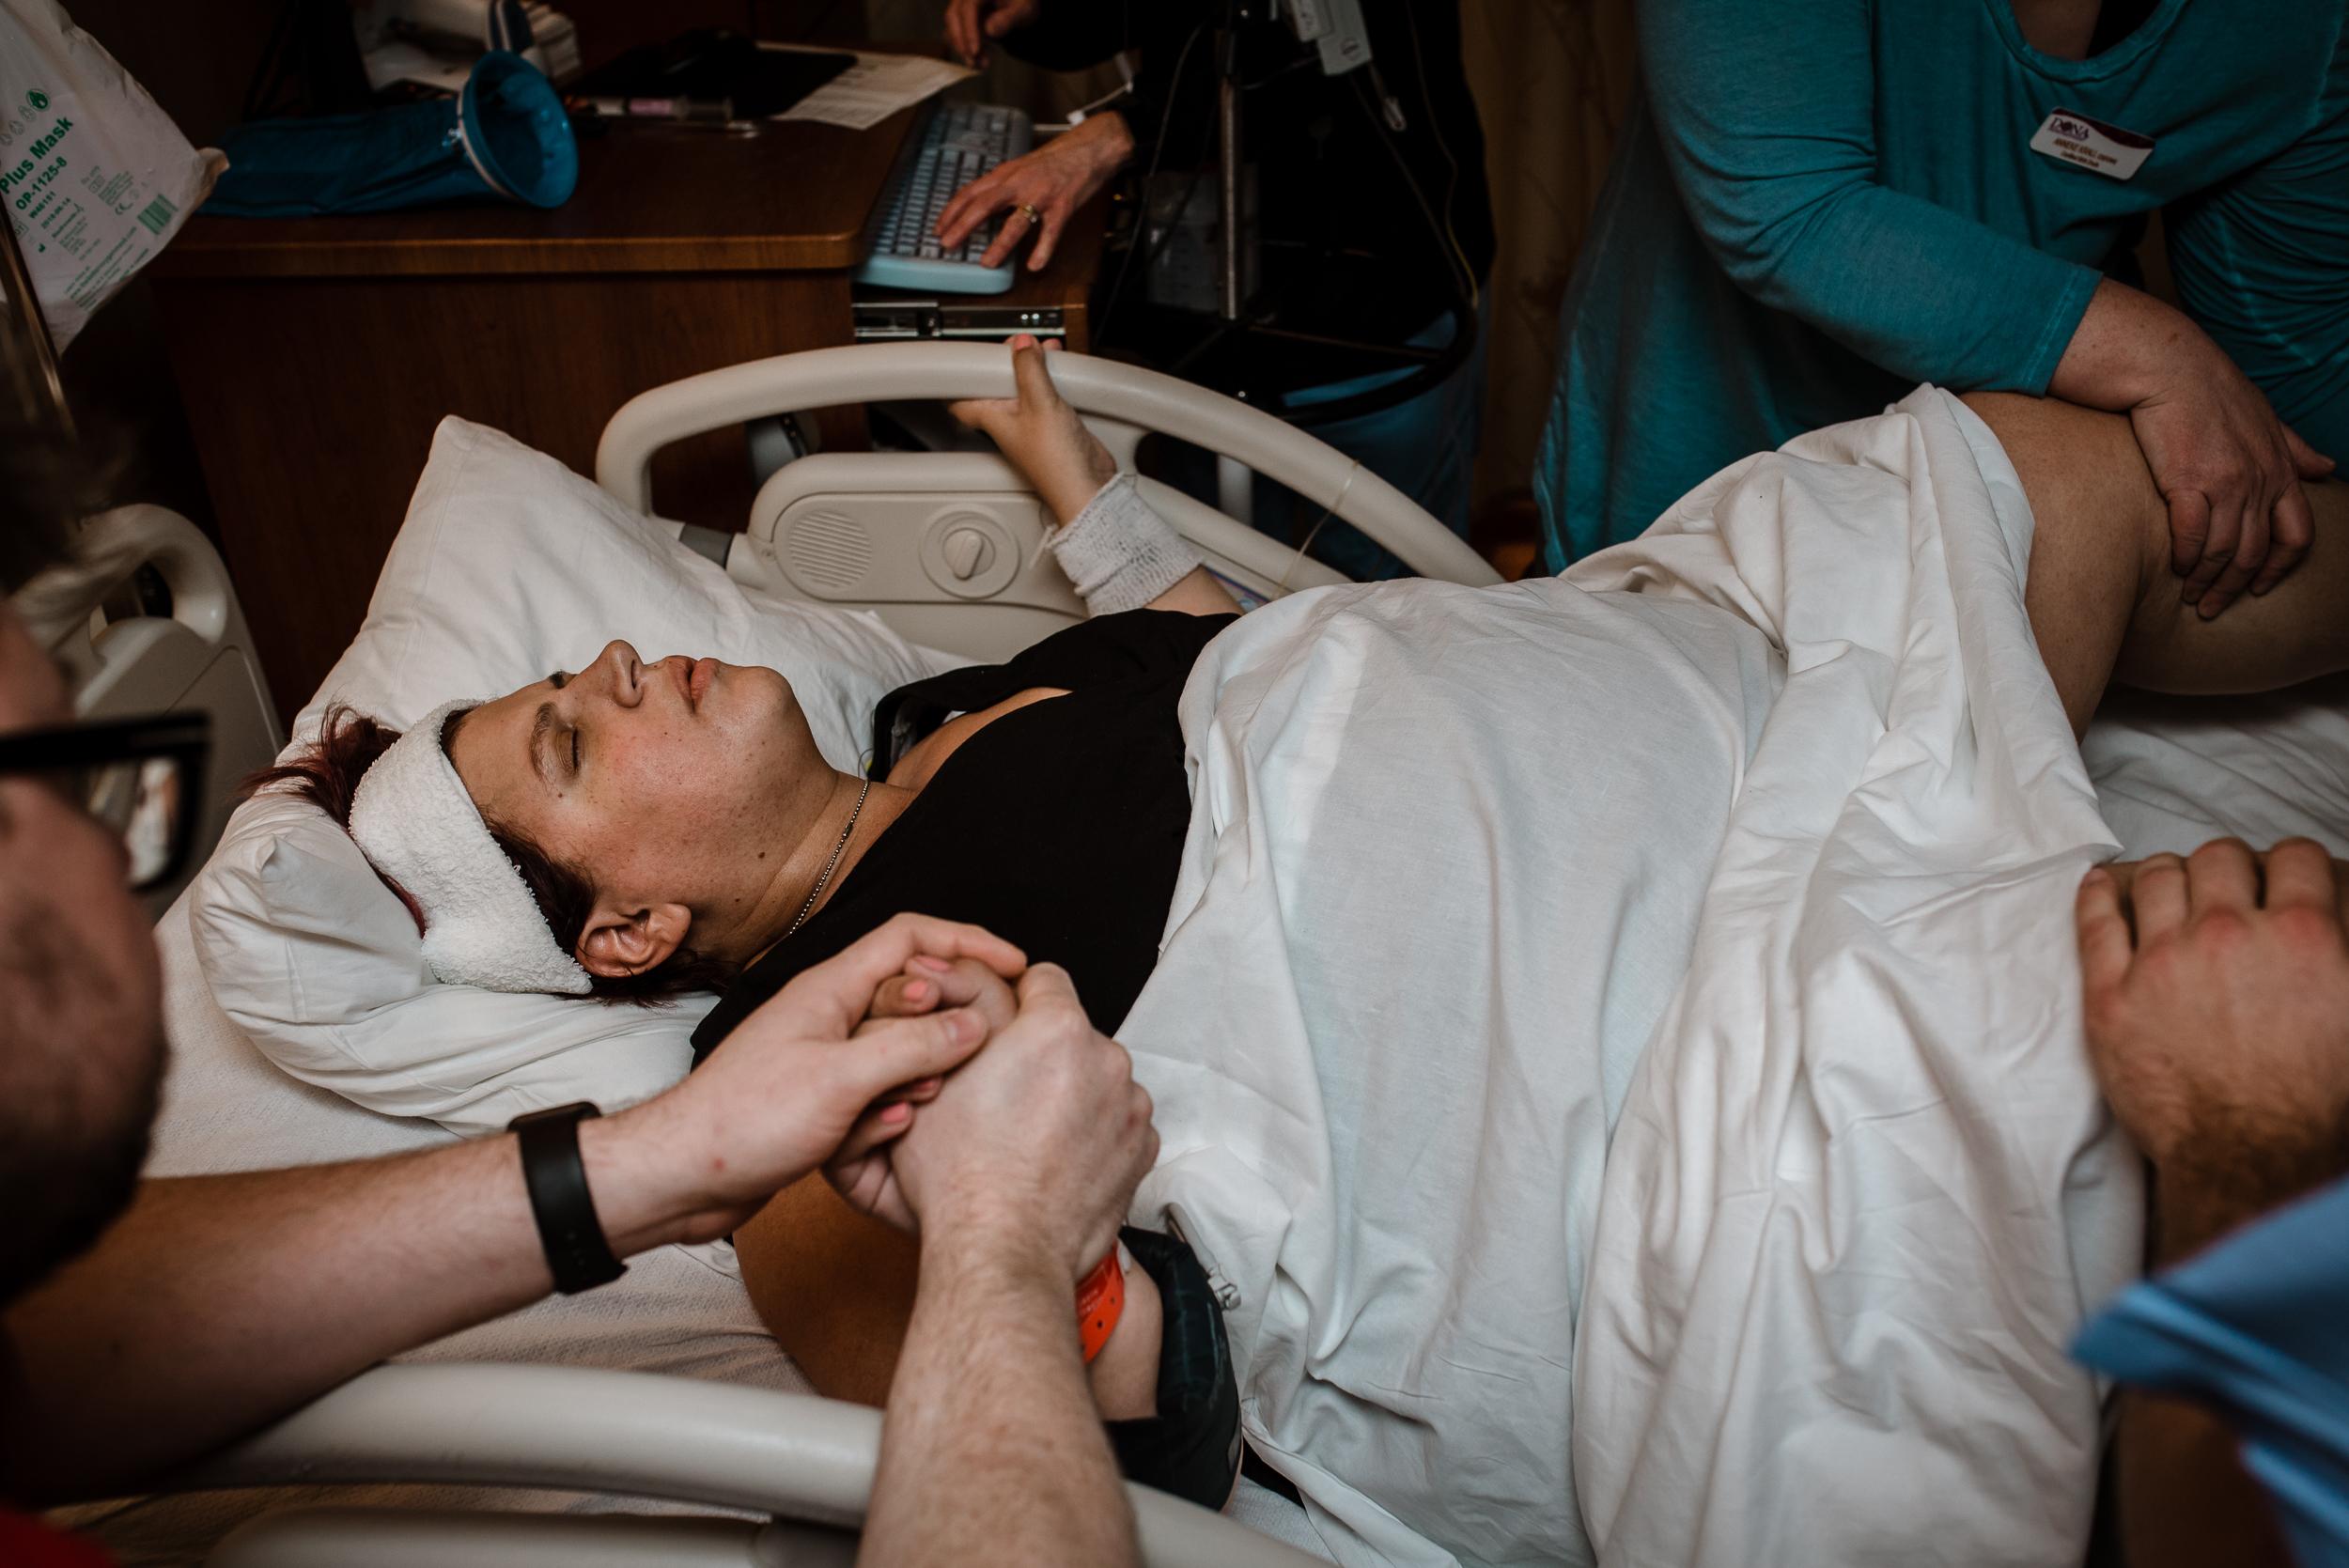 Meredith Westin Photography- Minneapolis Birth Stories and Films-November 08, 2018-141735.jpg